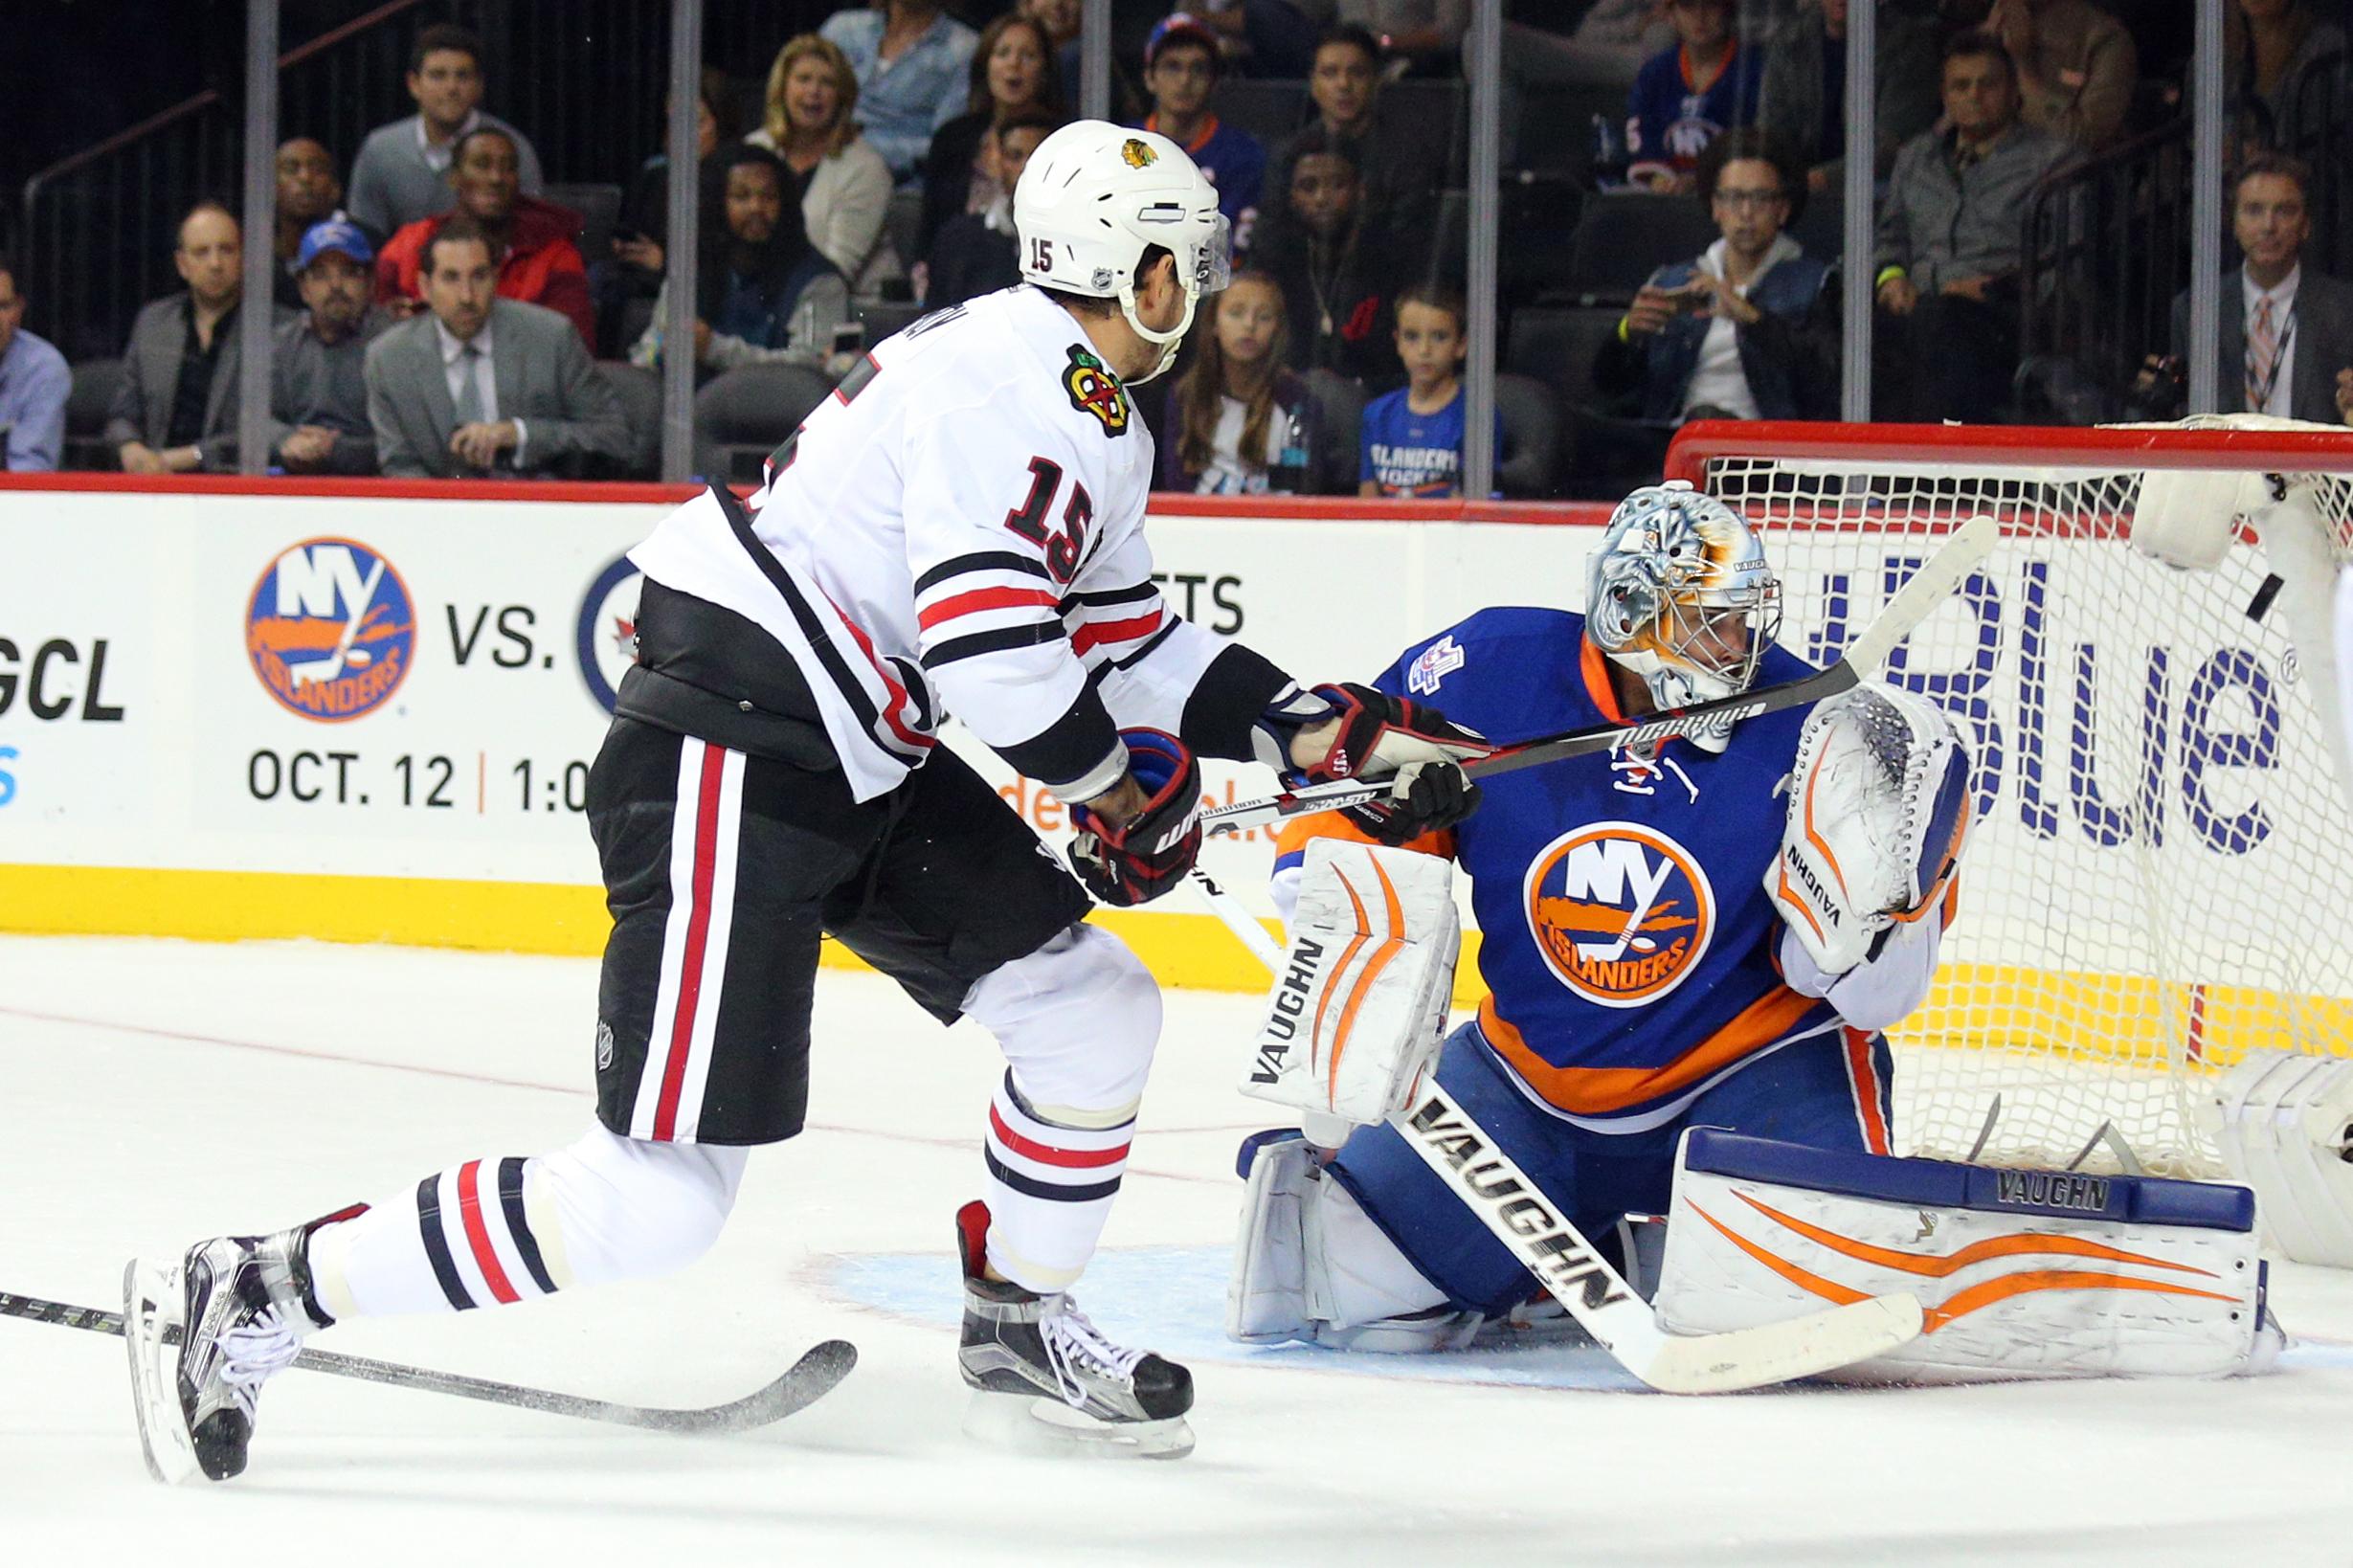 NHL: Chicago Blackhawks at New York Islanders